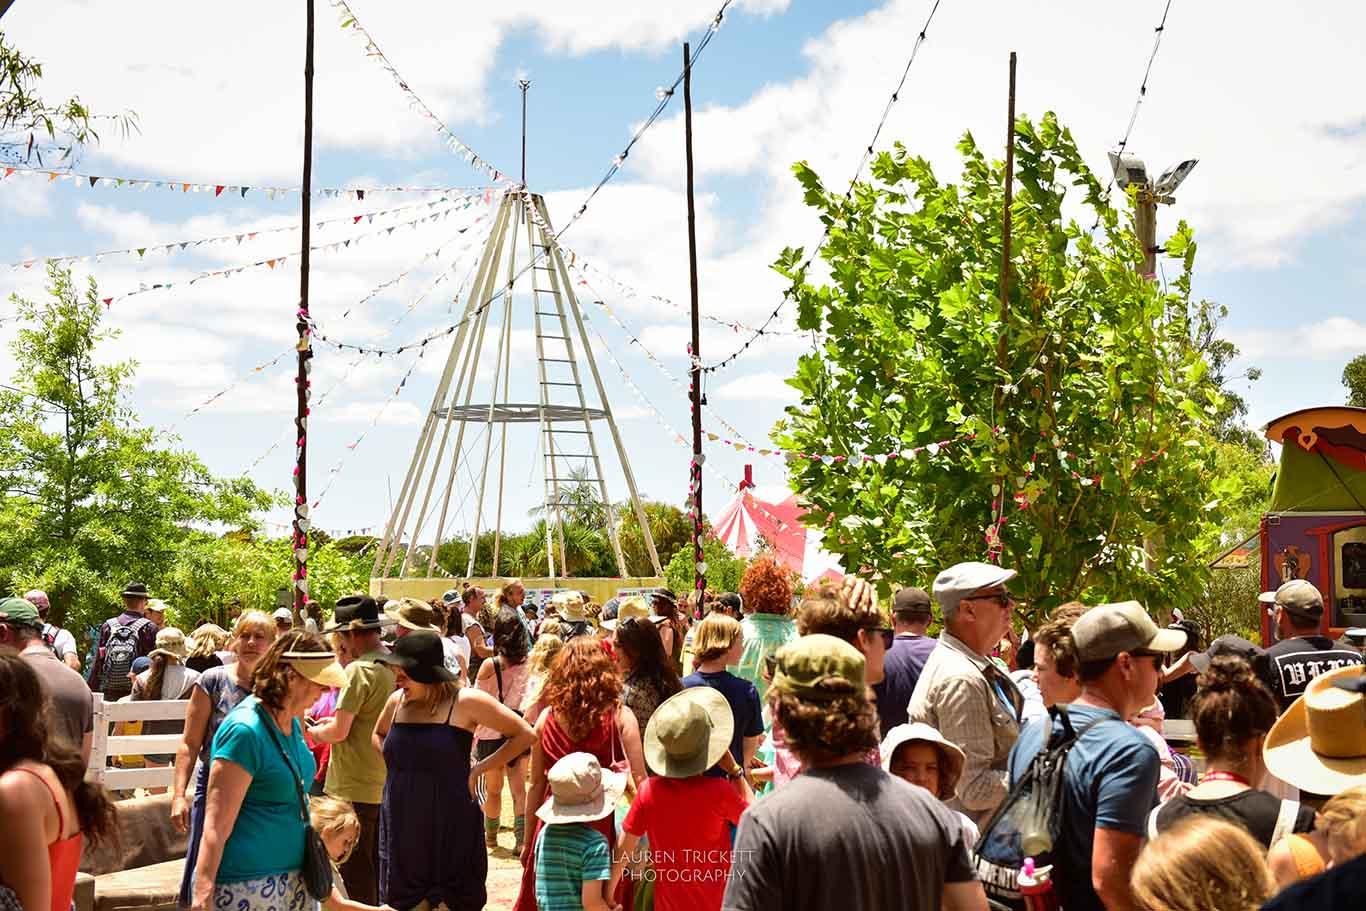 crowds at Karnidale Festival - Lunar Circus Australia